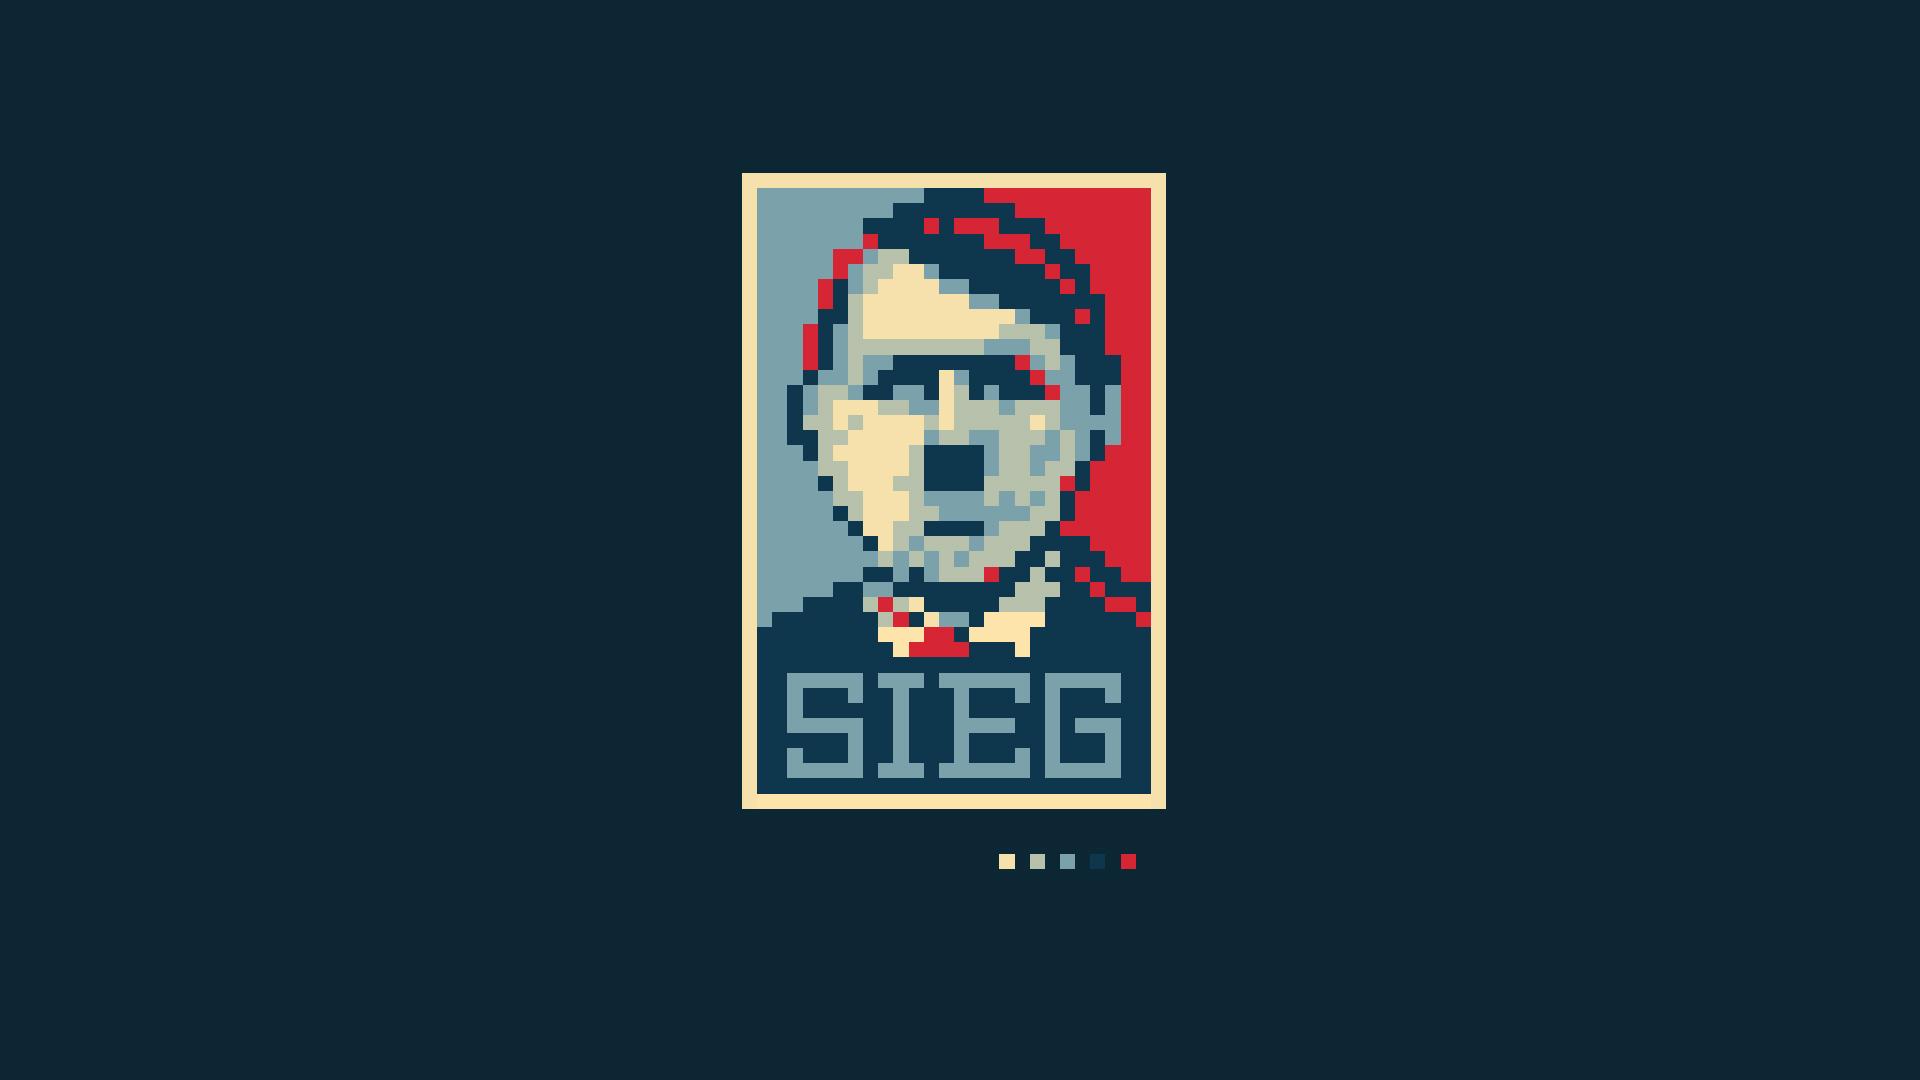 Adolf Hitler pixel art parody politics